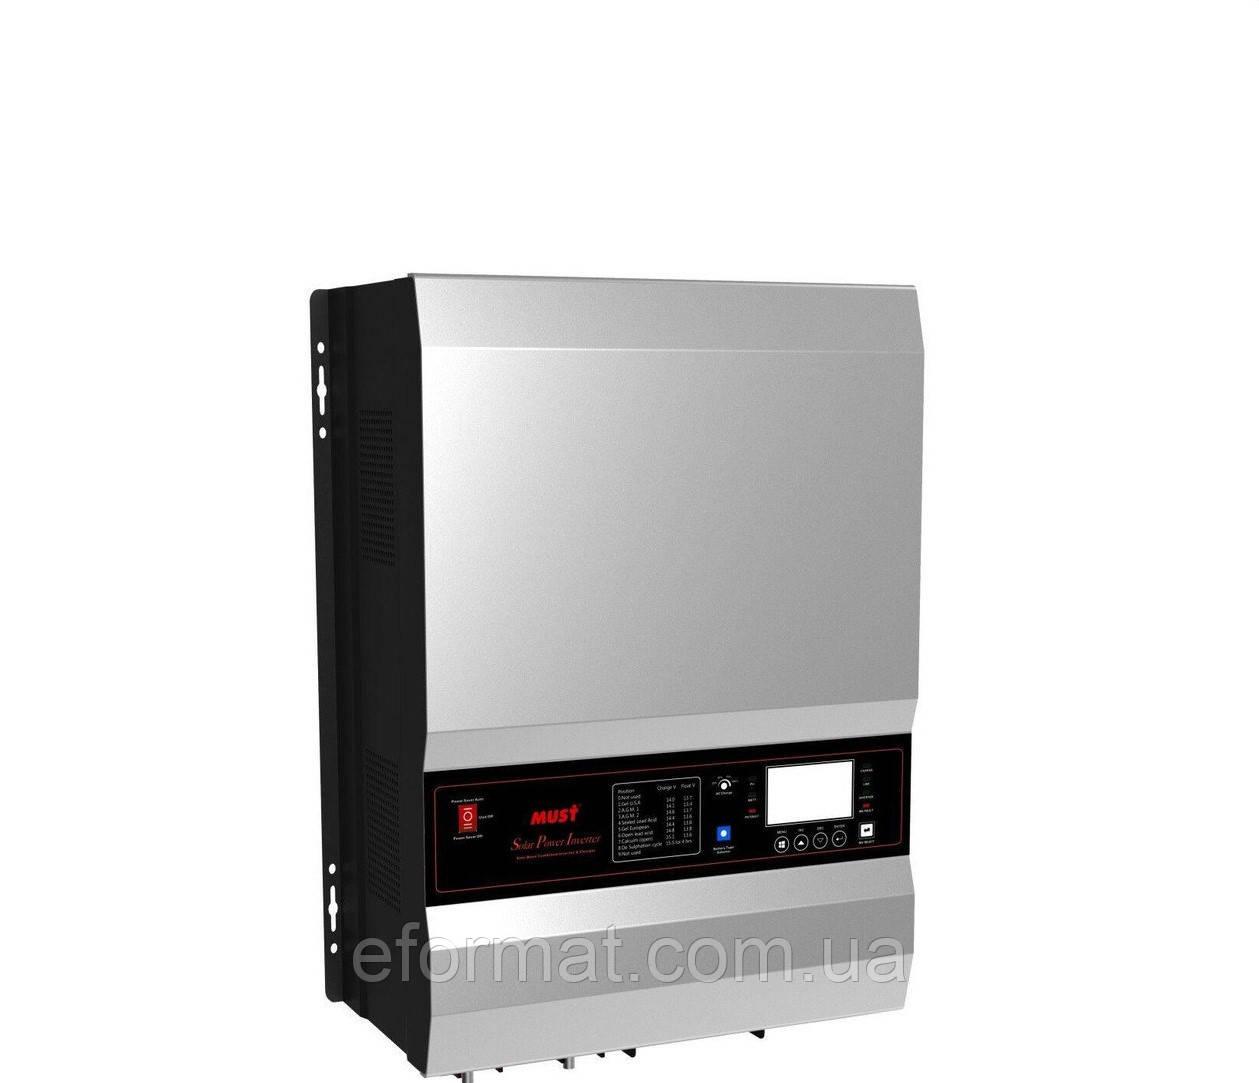 Инвертор Altek PV35-4048 MPK со встроенным МРРТ контроллером  60А, 4000Вт